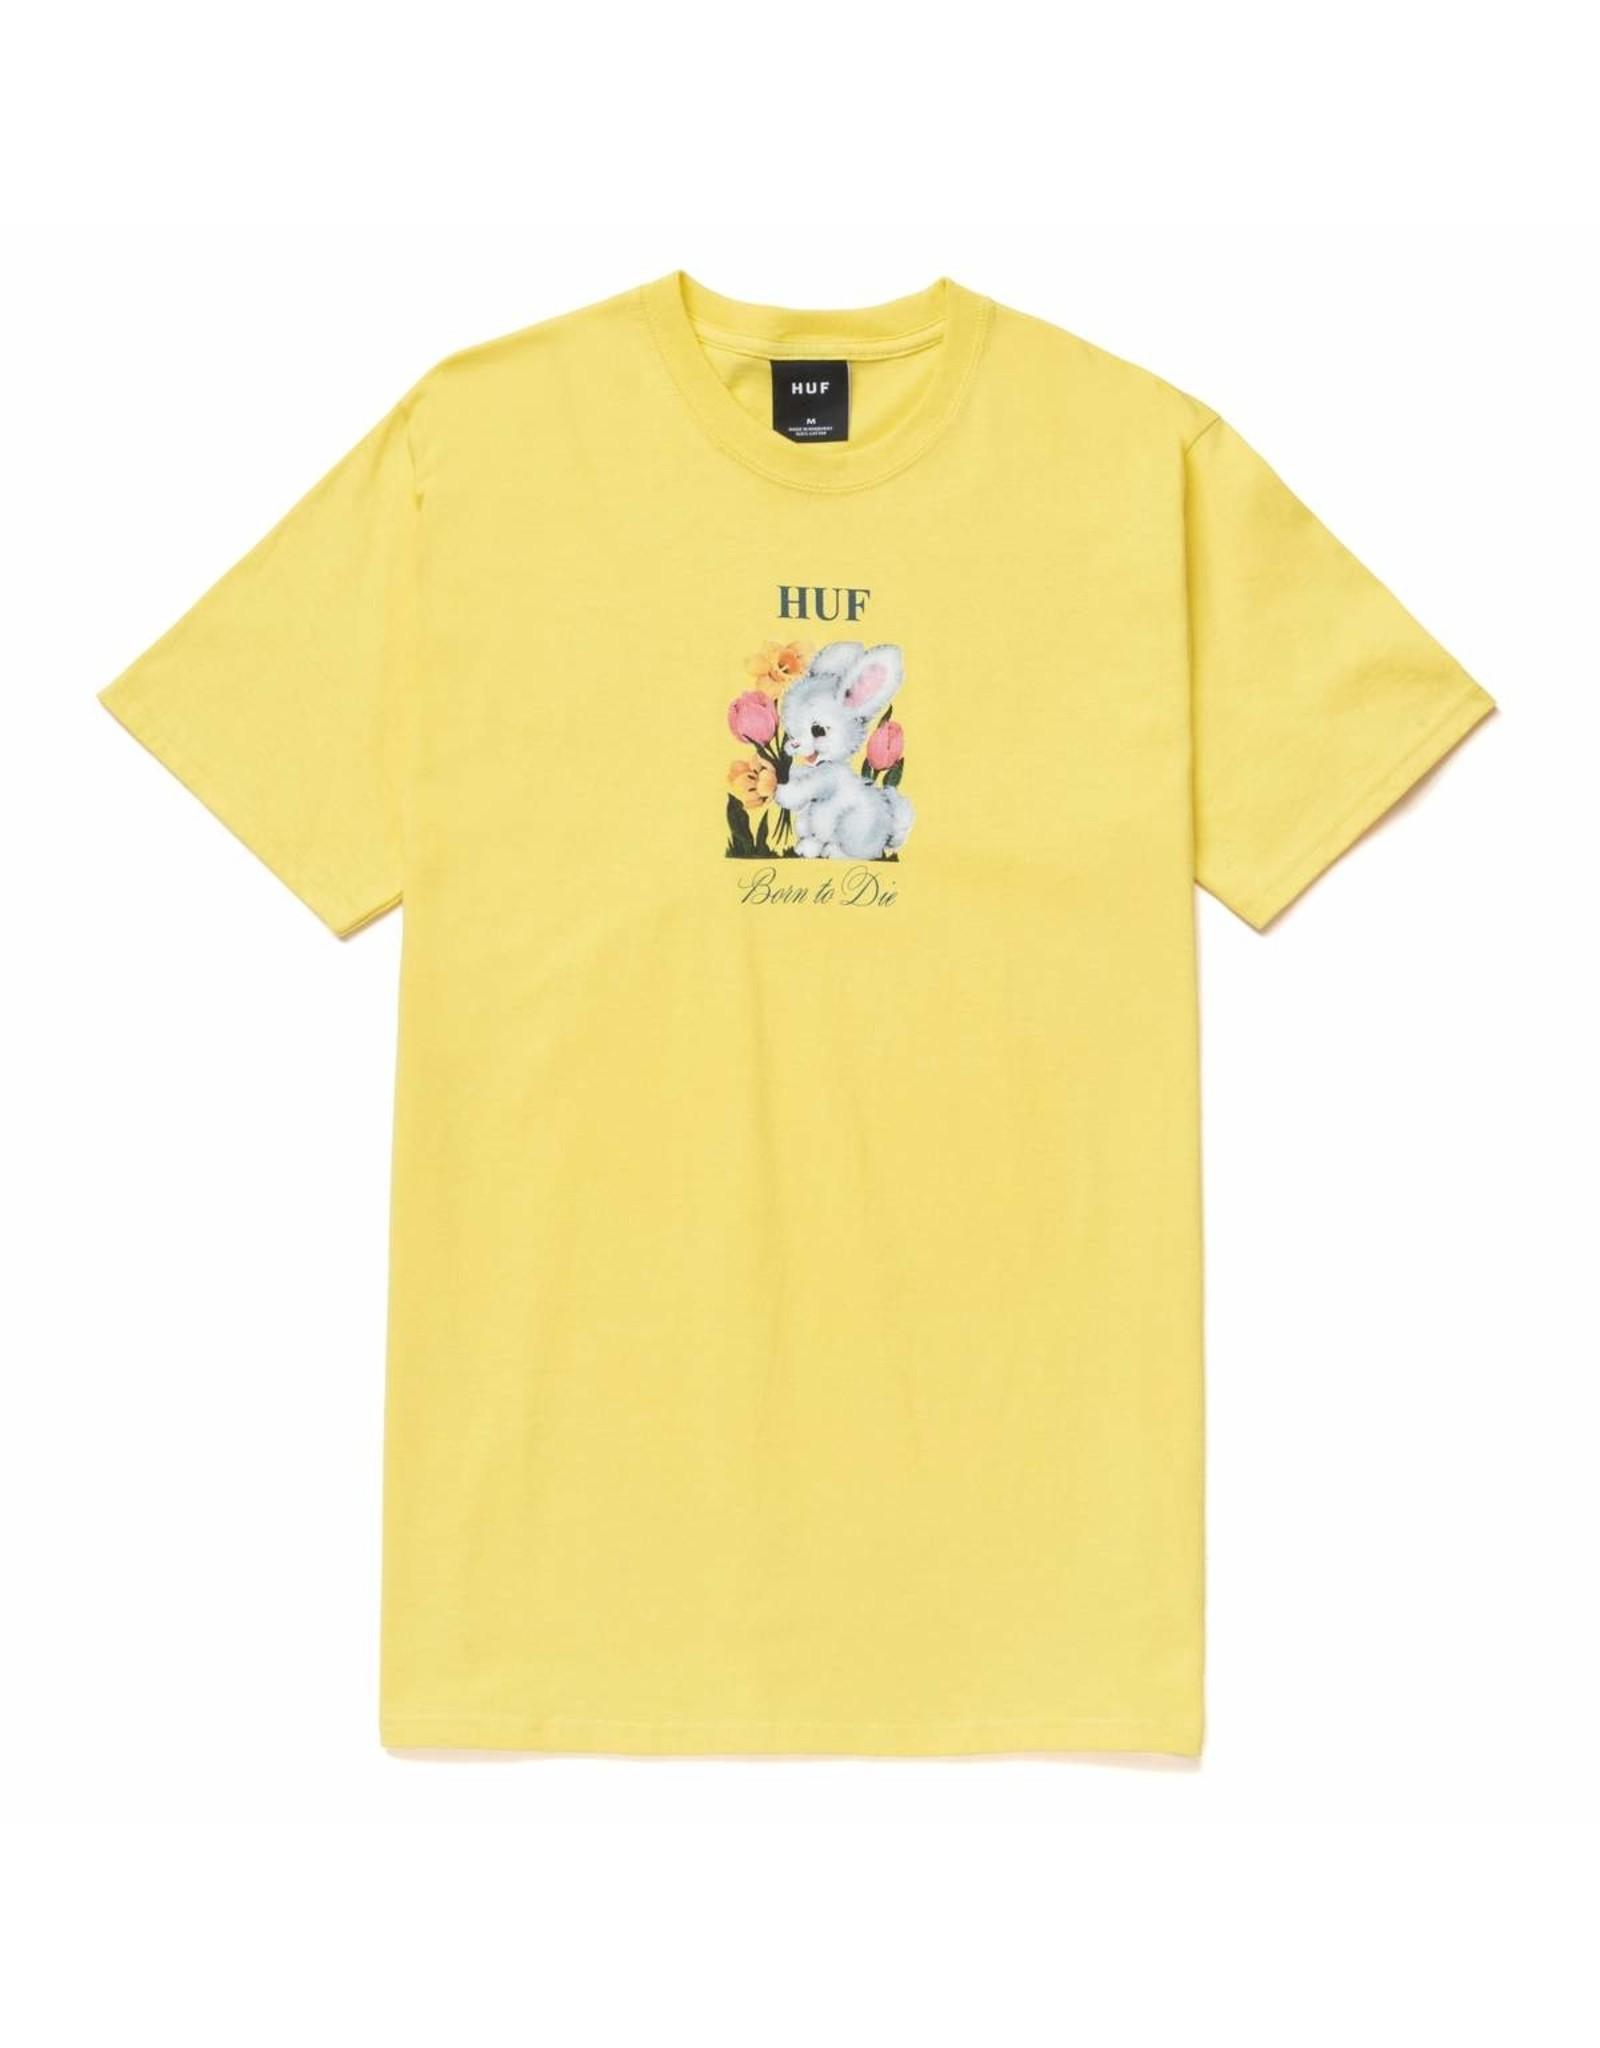 HUF HUF - BORN TO DIE S/S - YELLOW